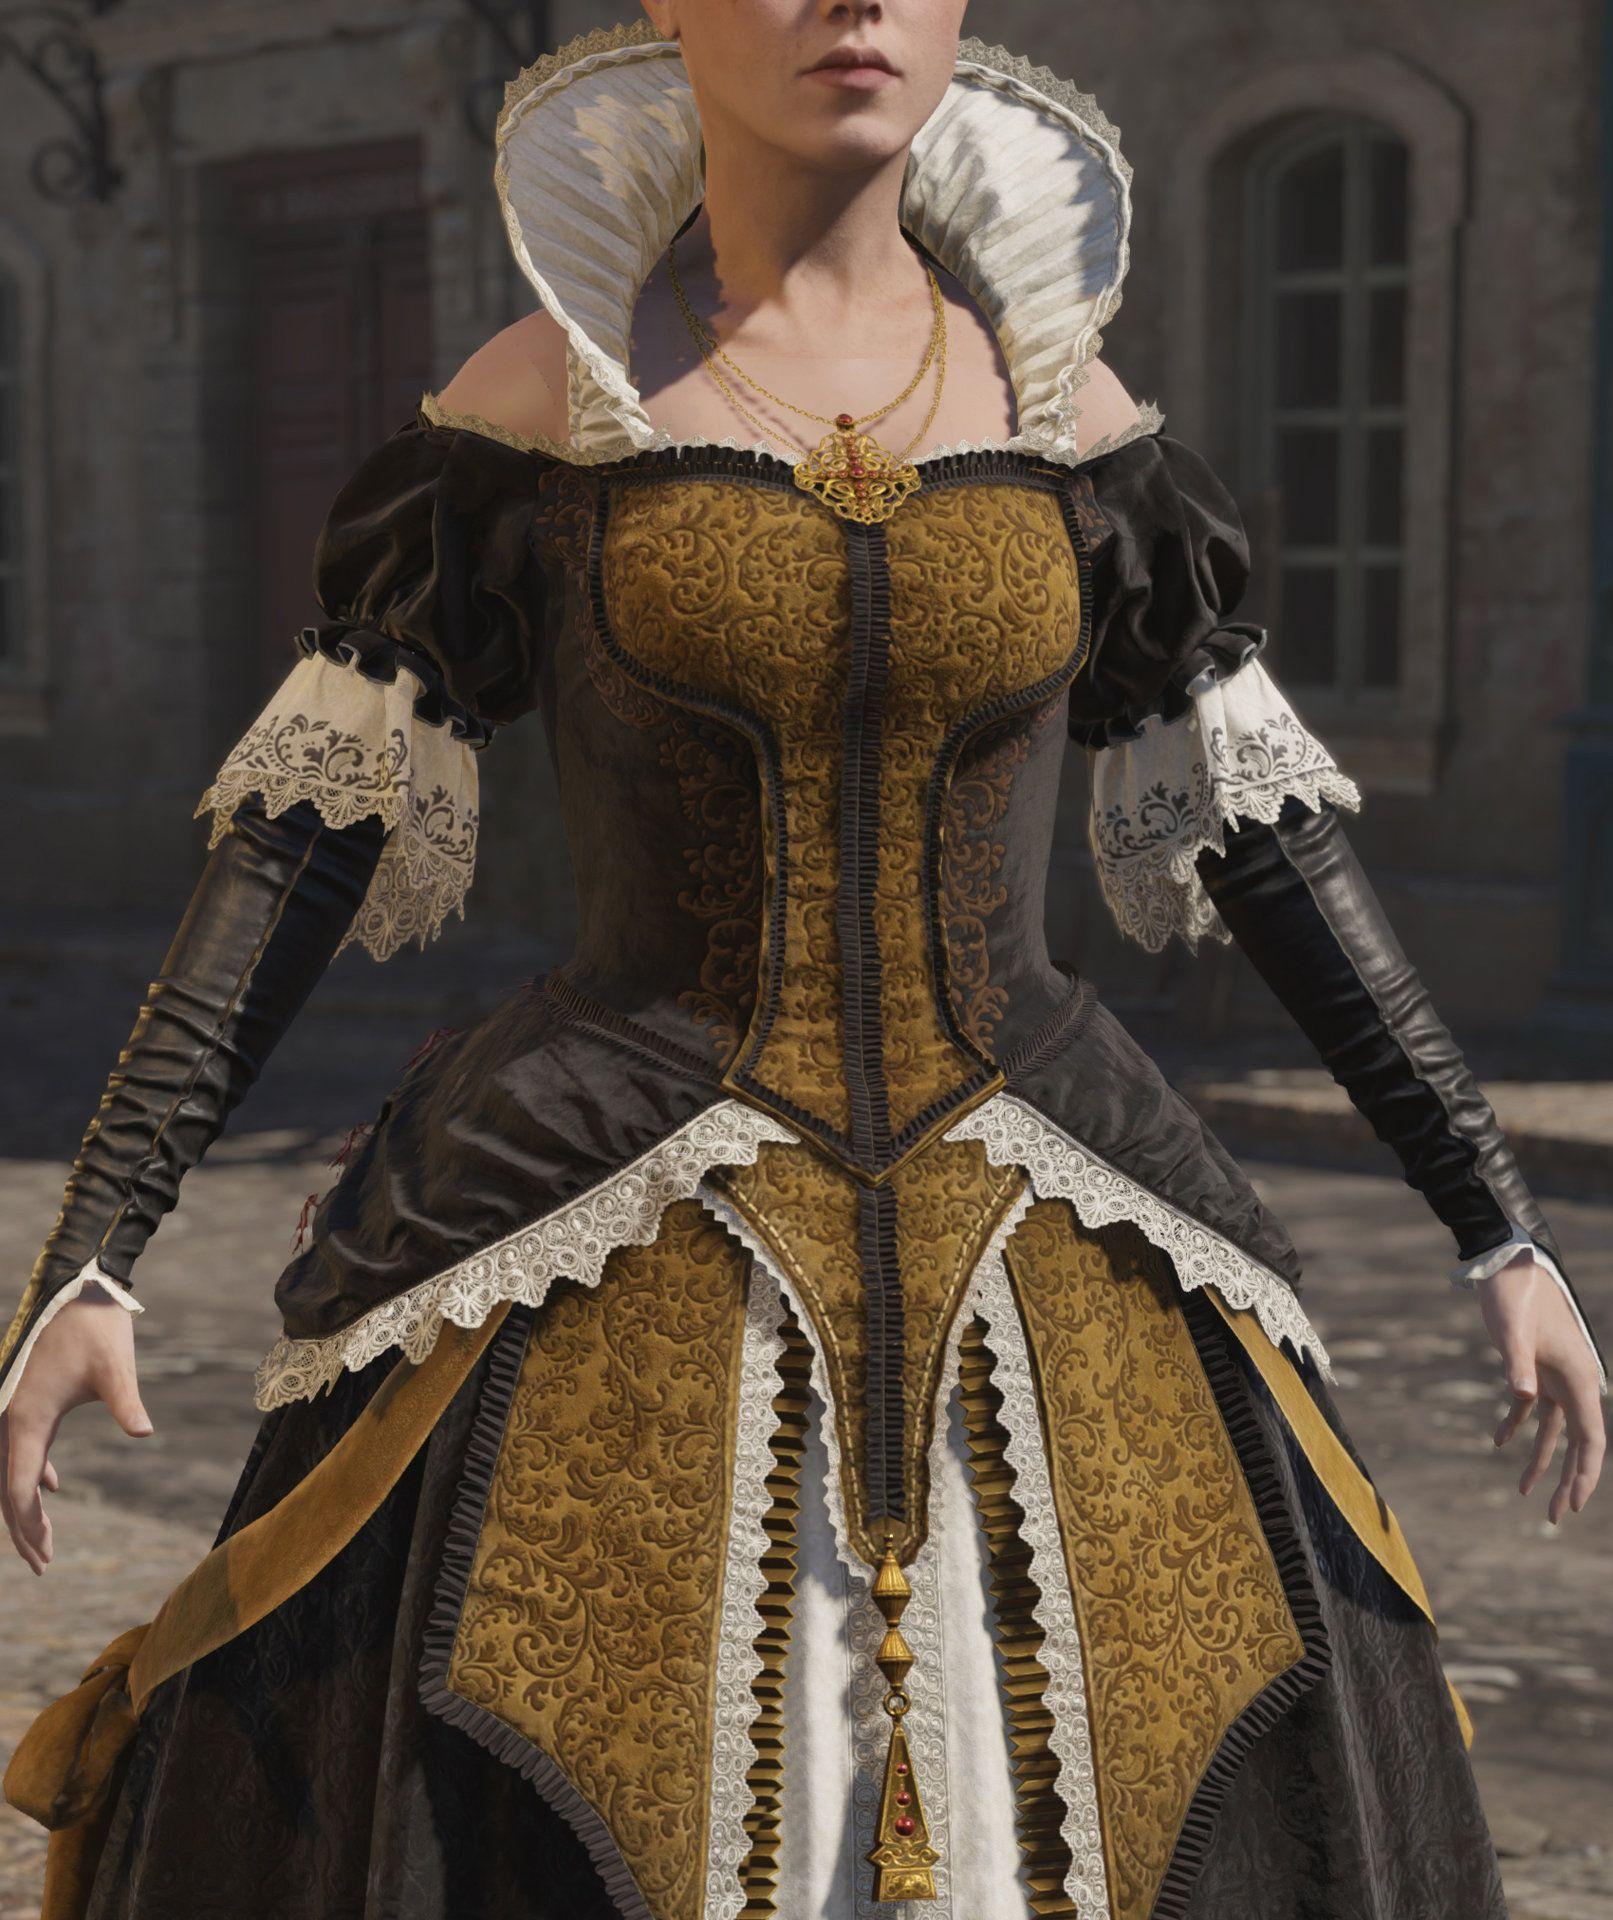 Assassin S Creed Unity Elise S Evening Dress Mathieu Goulet